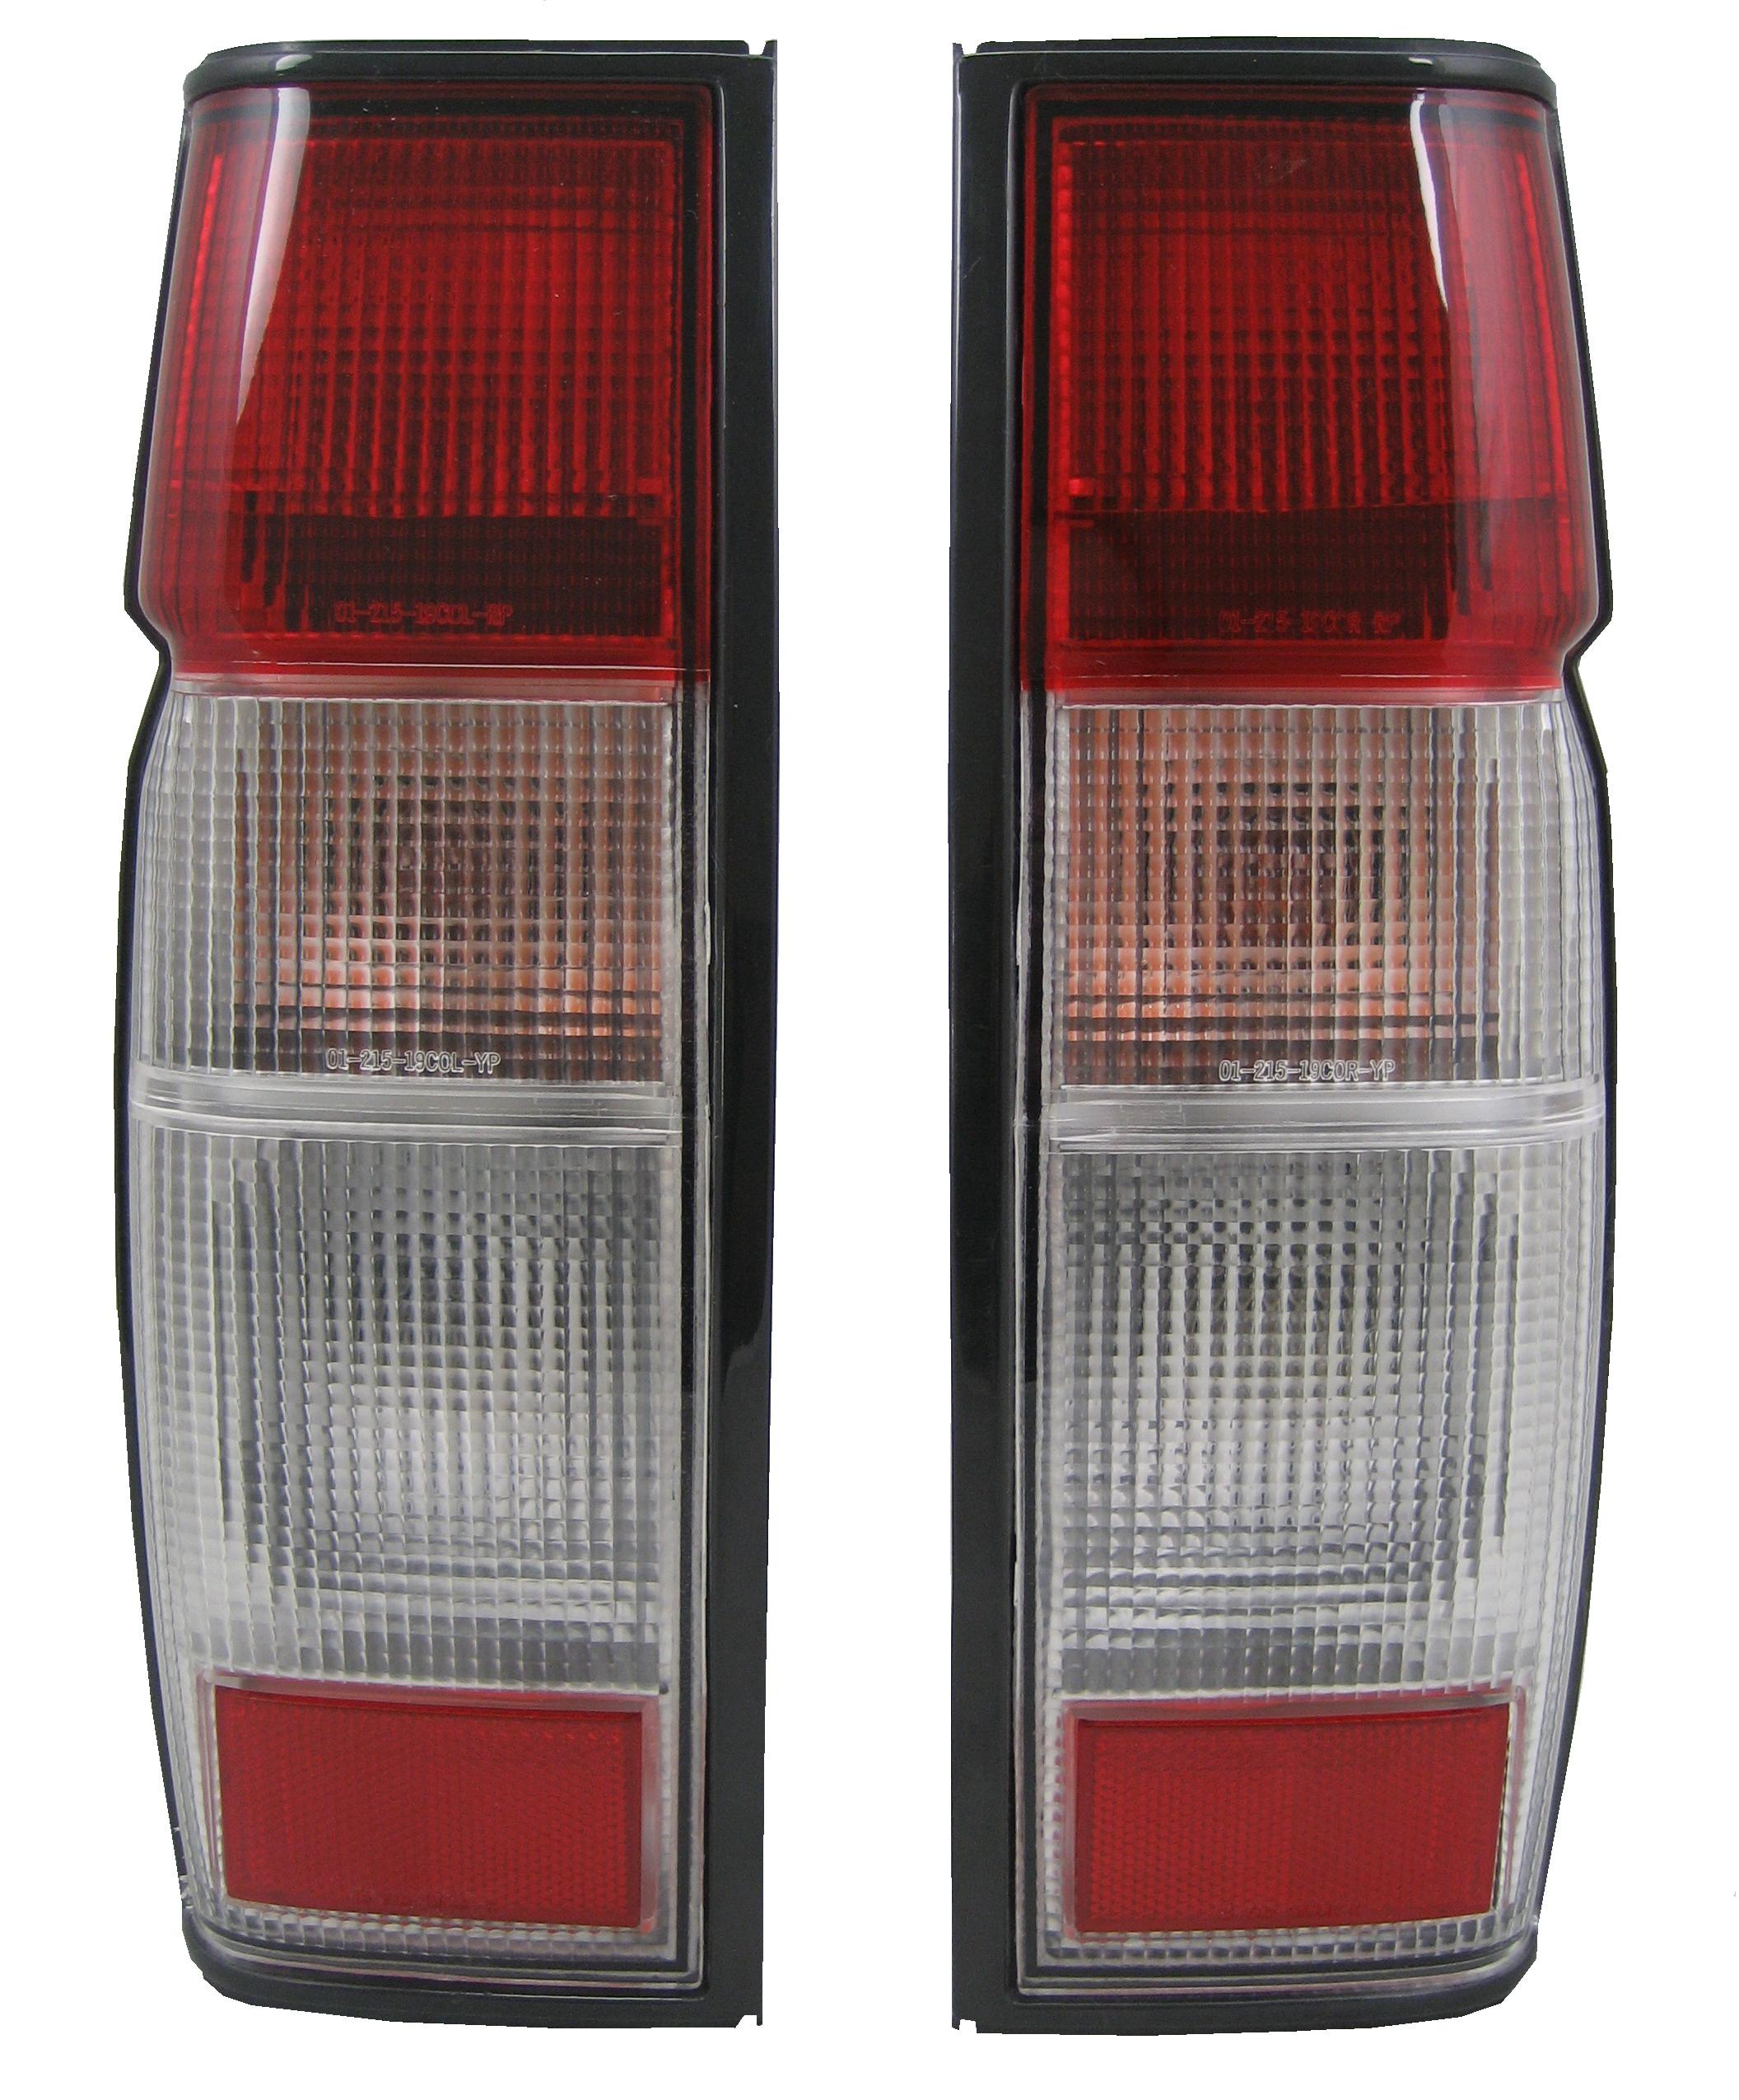 rear light lamp for nissan navara d21 pickup d22 np300 ... radiatore nissan navara d22